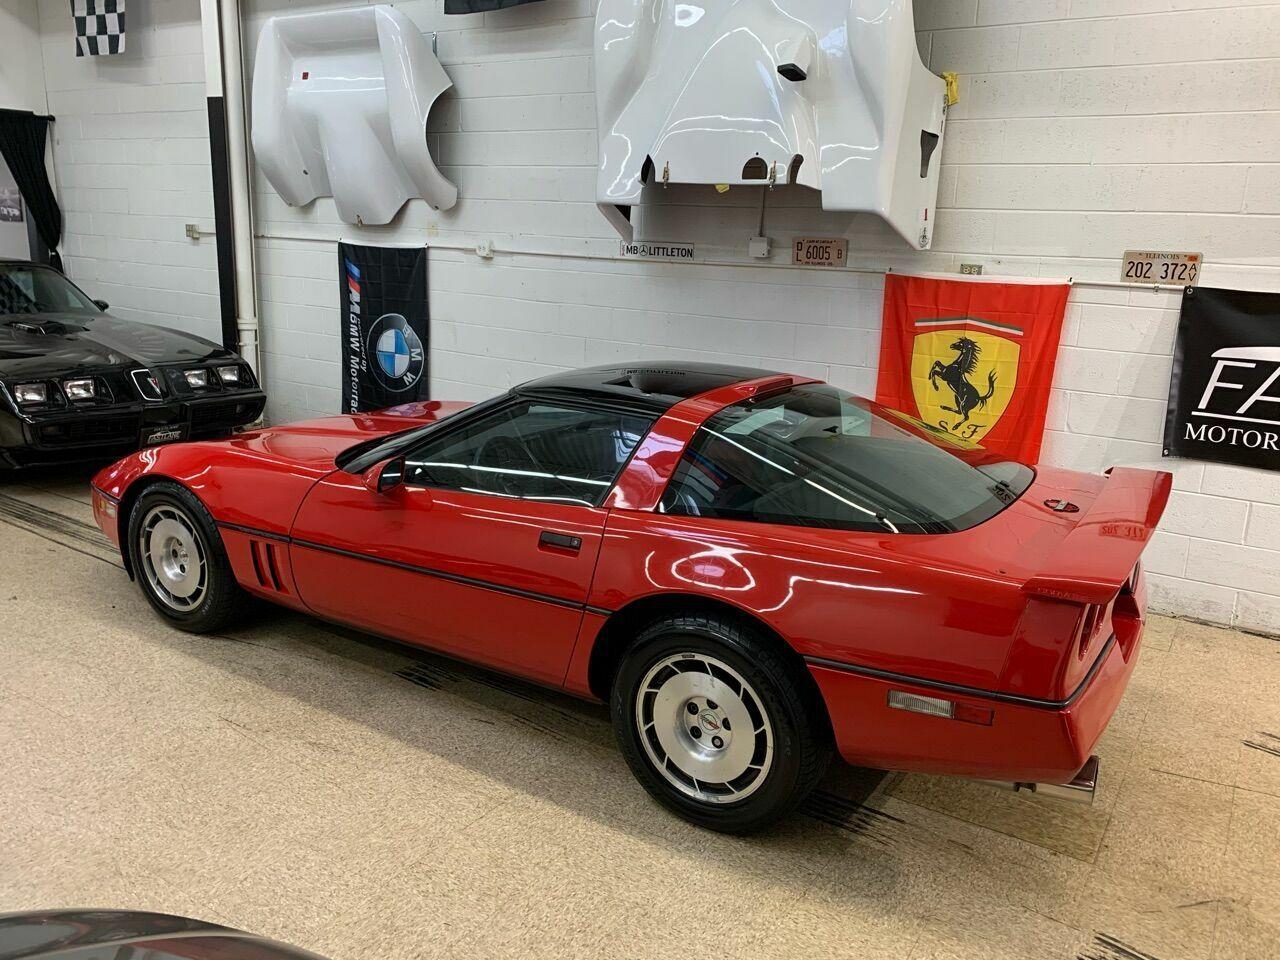 1986 Red Chevrolet Corvette   | C4 Corvette Photo 10